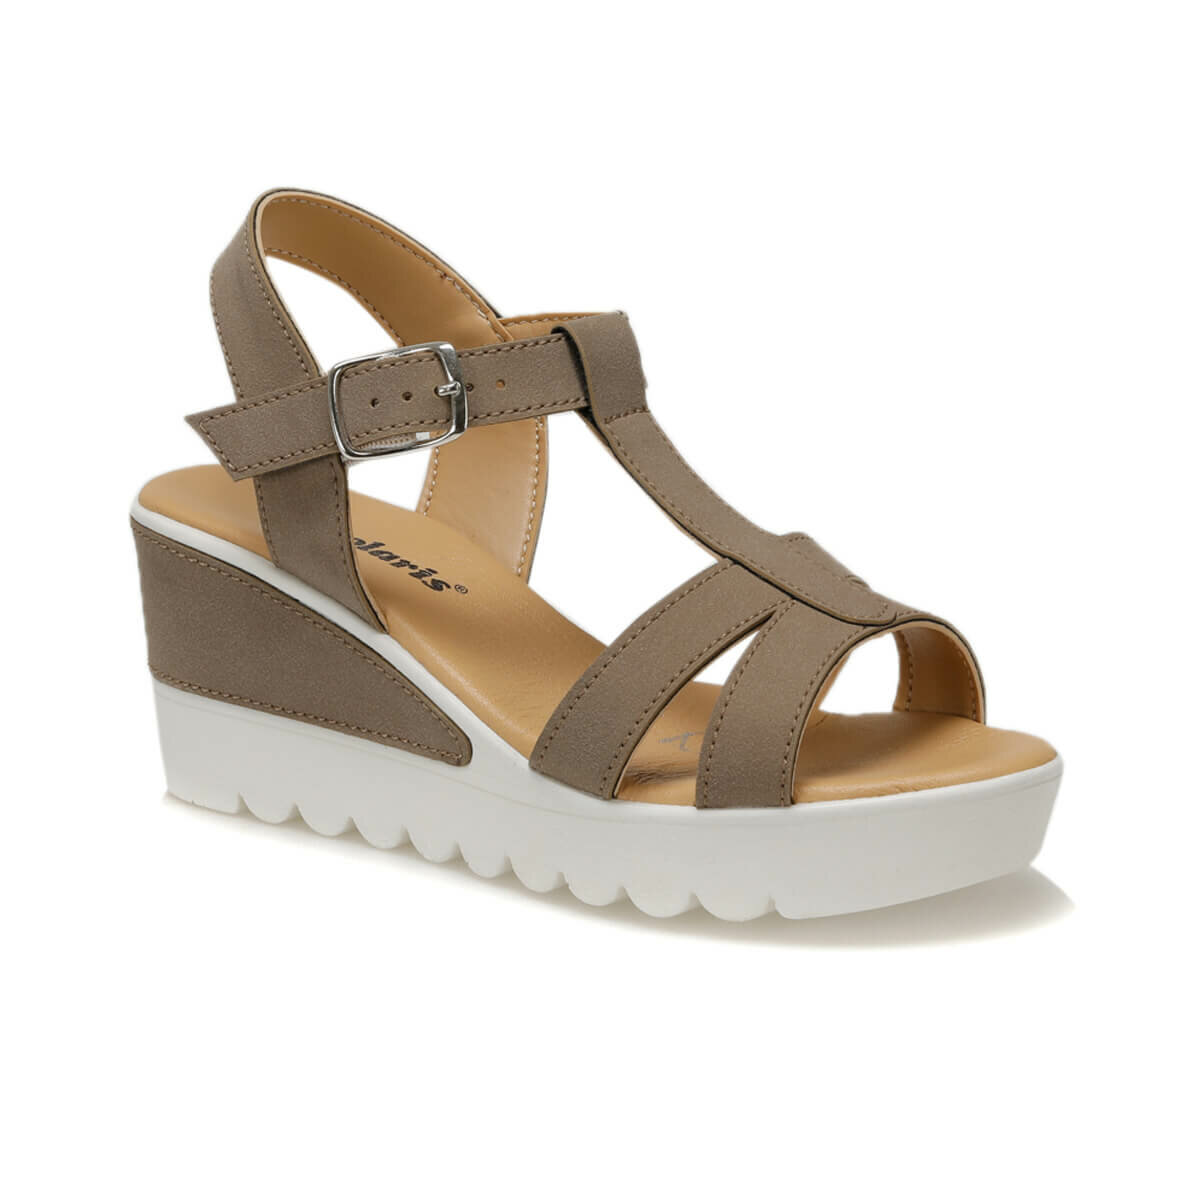 FLO Bronze Women Sandals Woman Summer Wedge Sandals Female  Bohemia High Heel Sandals Fashion Ankle Strap Open Toe Ladies Shoes Polaris 91.313642.Z